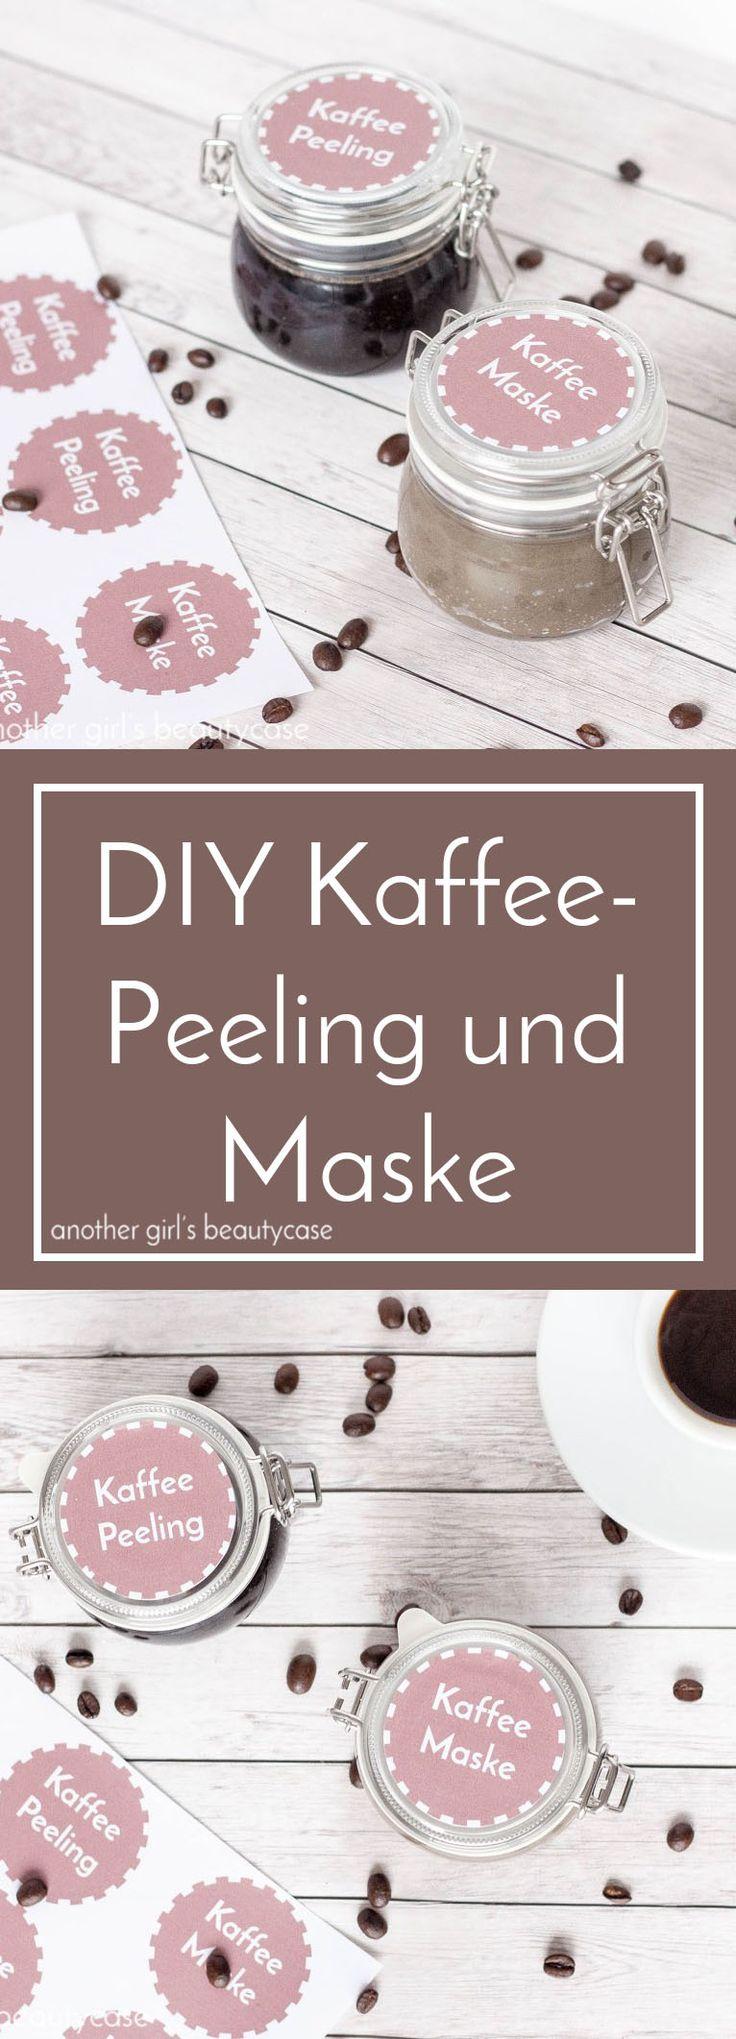 DIY Kaffeepeeling und -maske